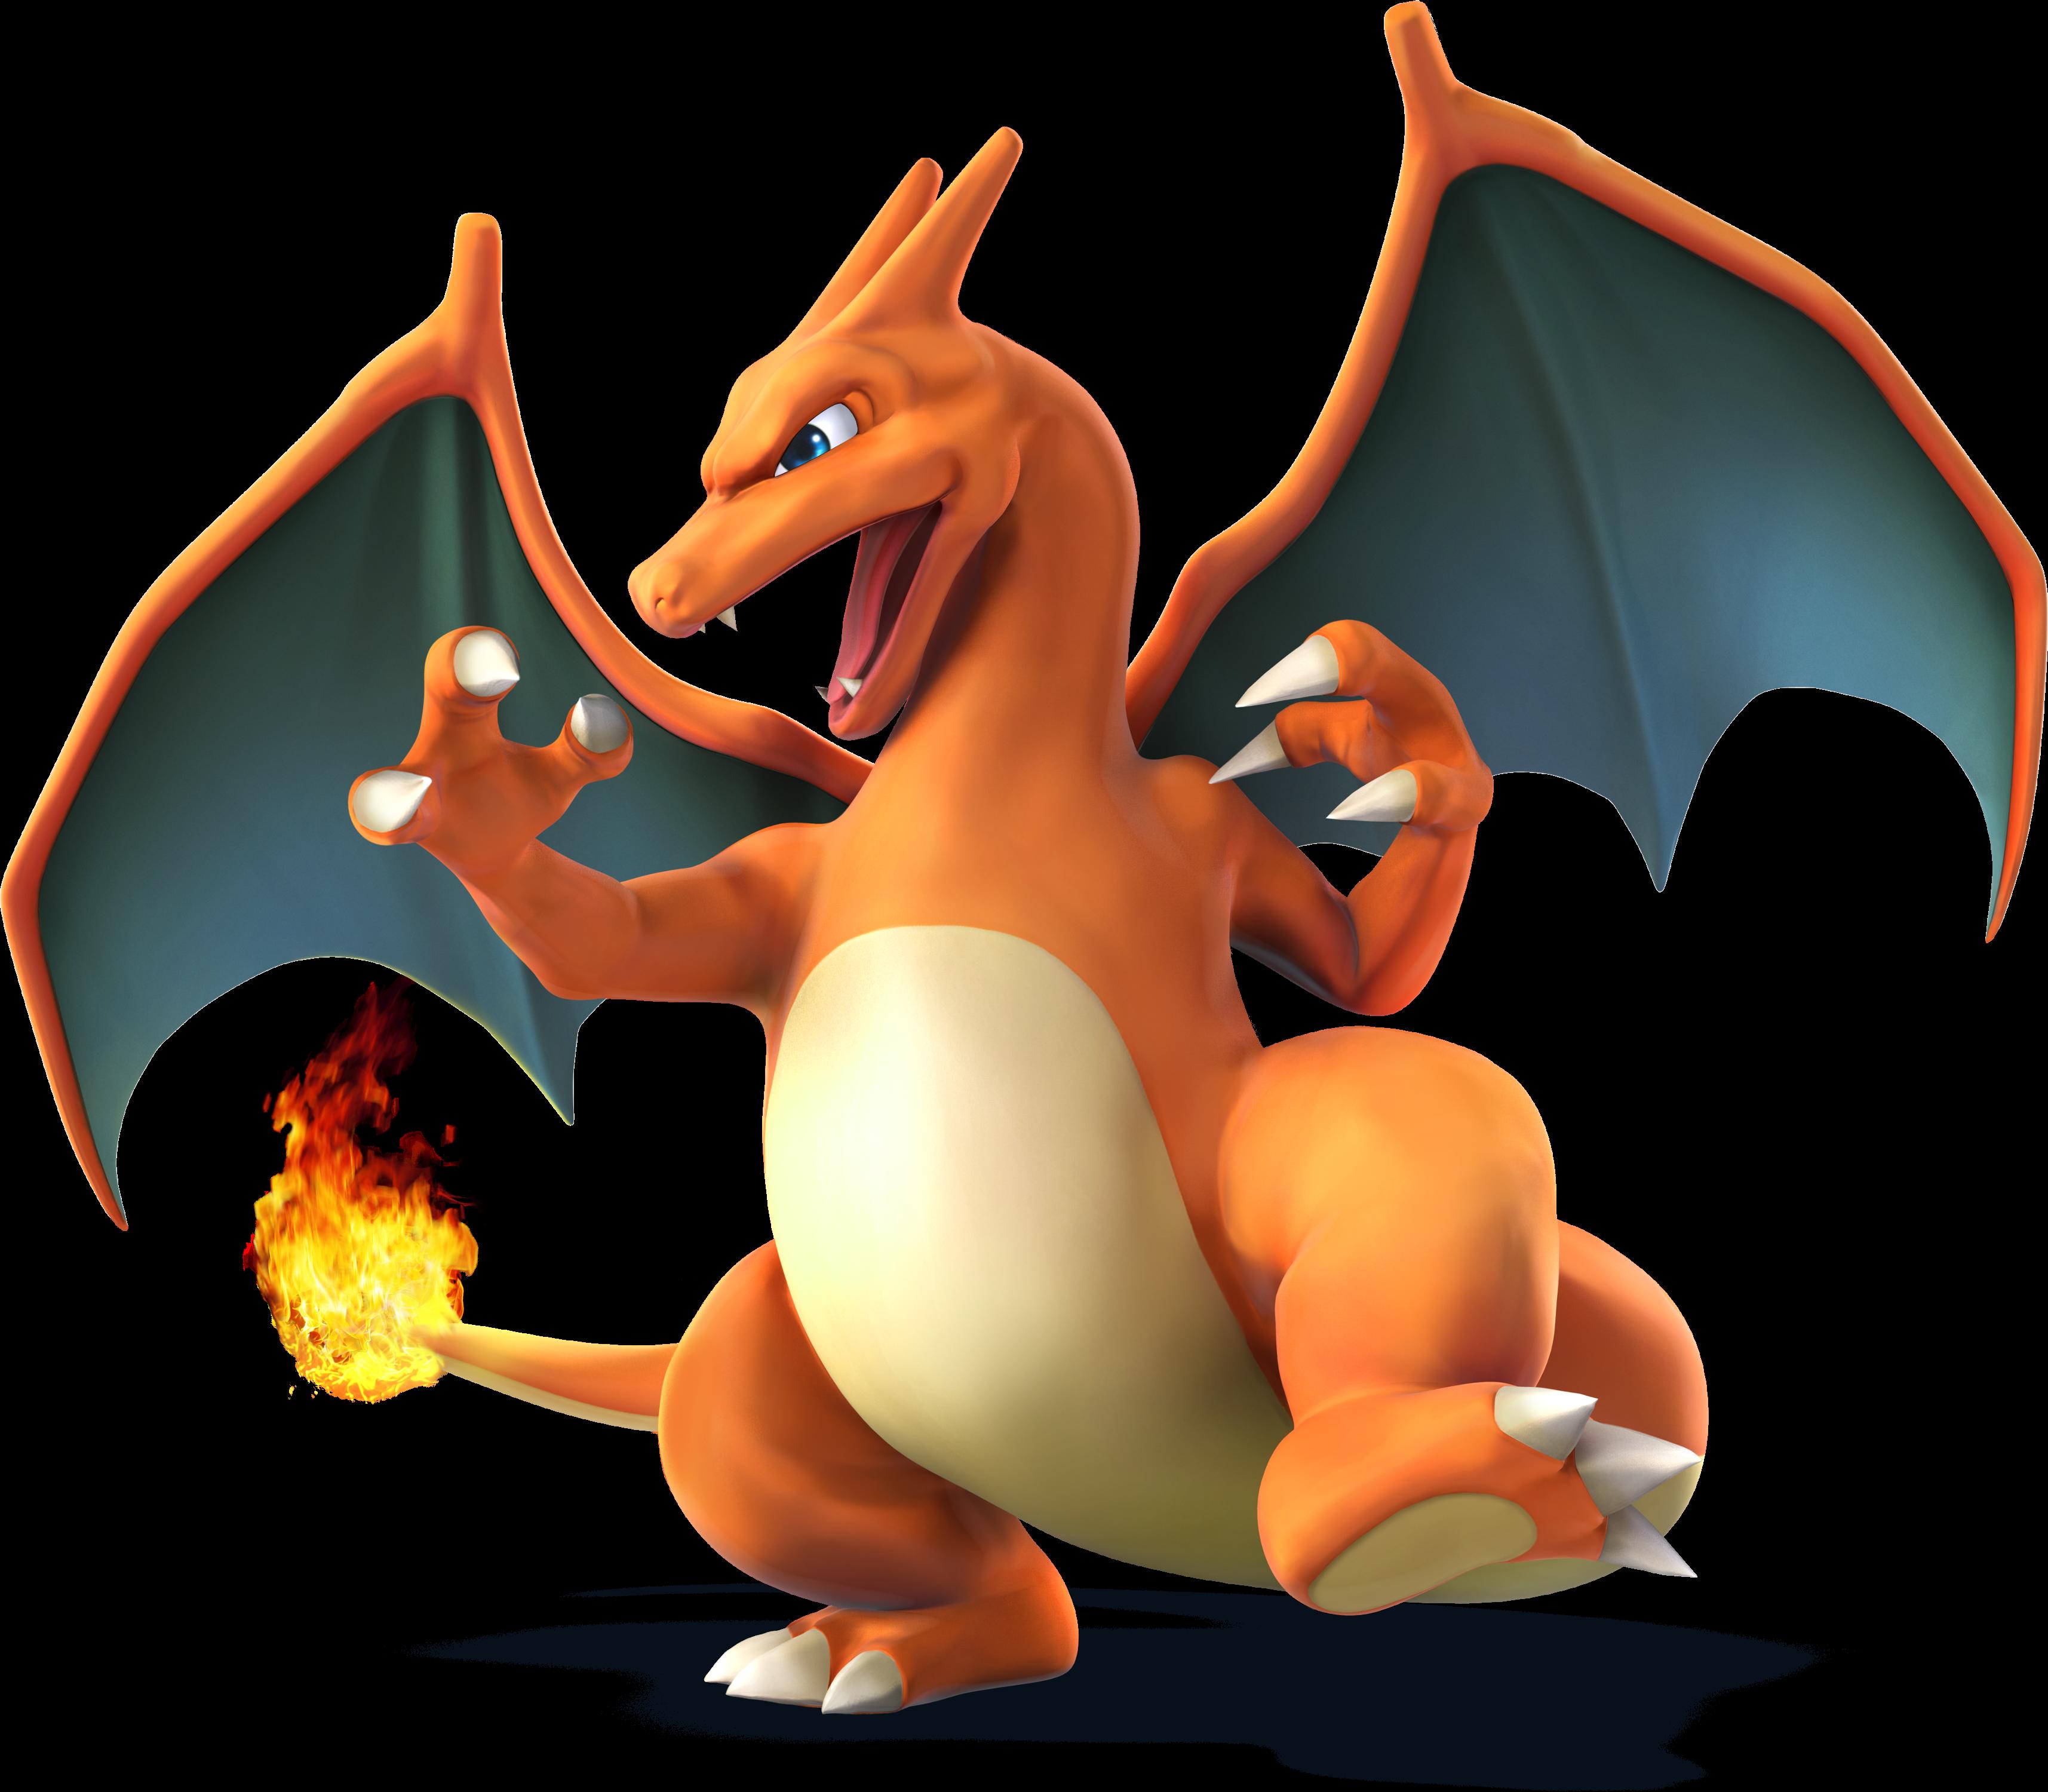 Super Smash Bros 3DS/Wii U Charizard_SSB4